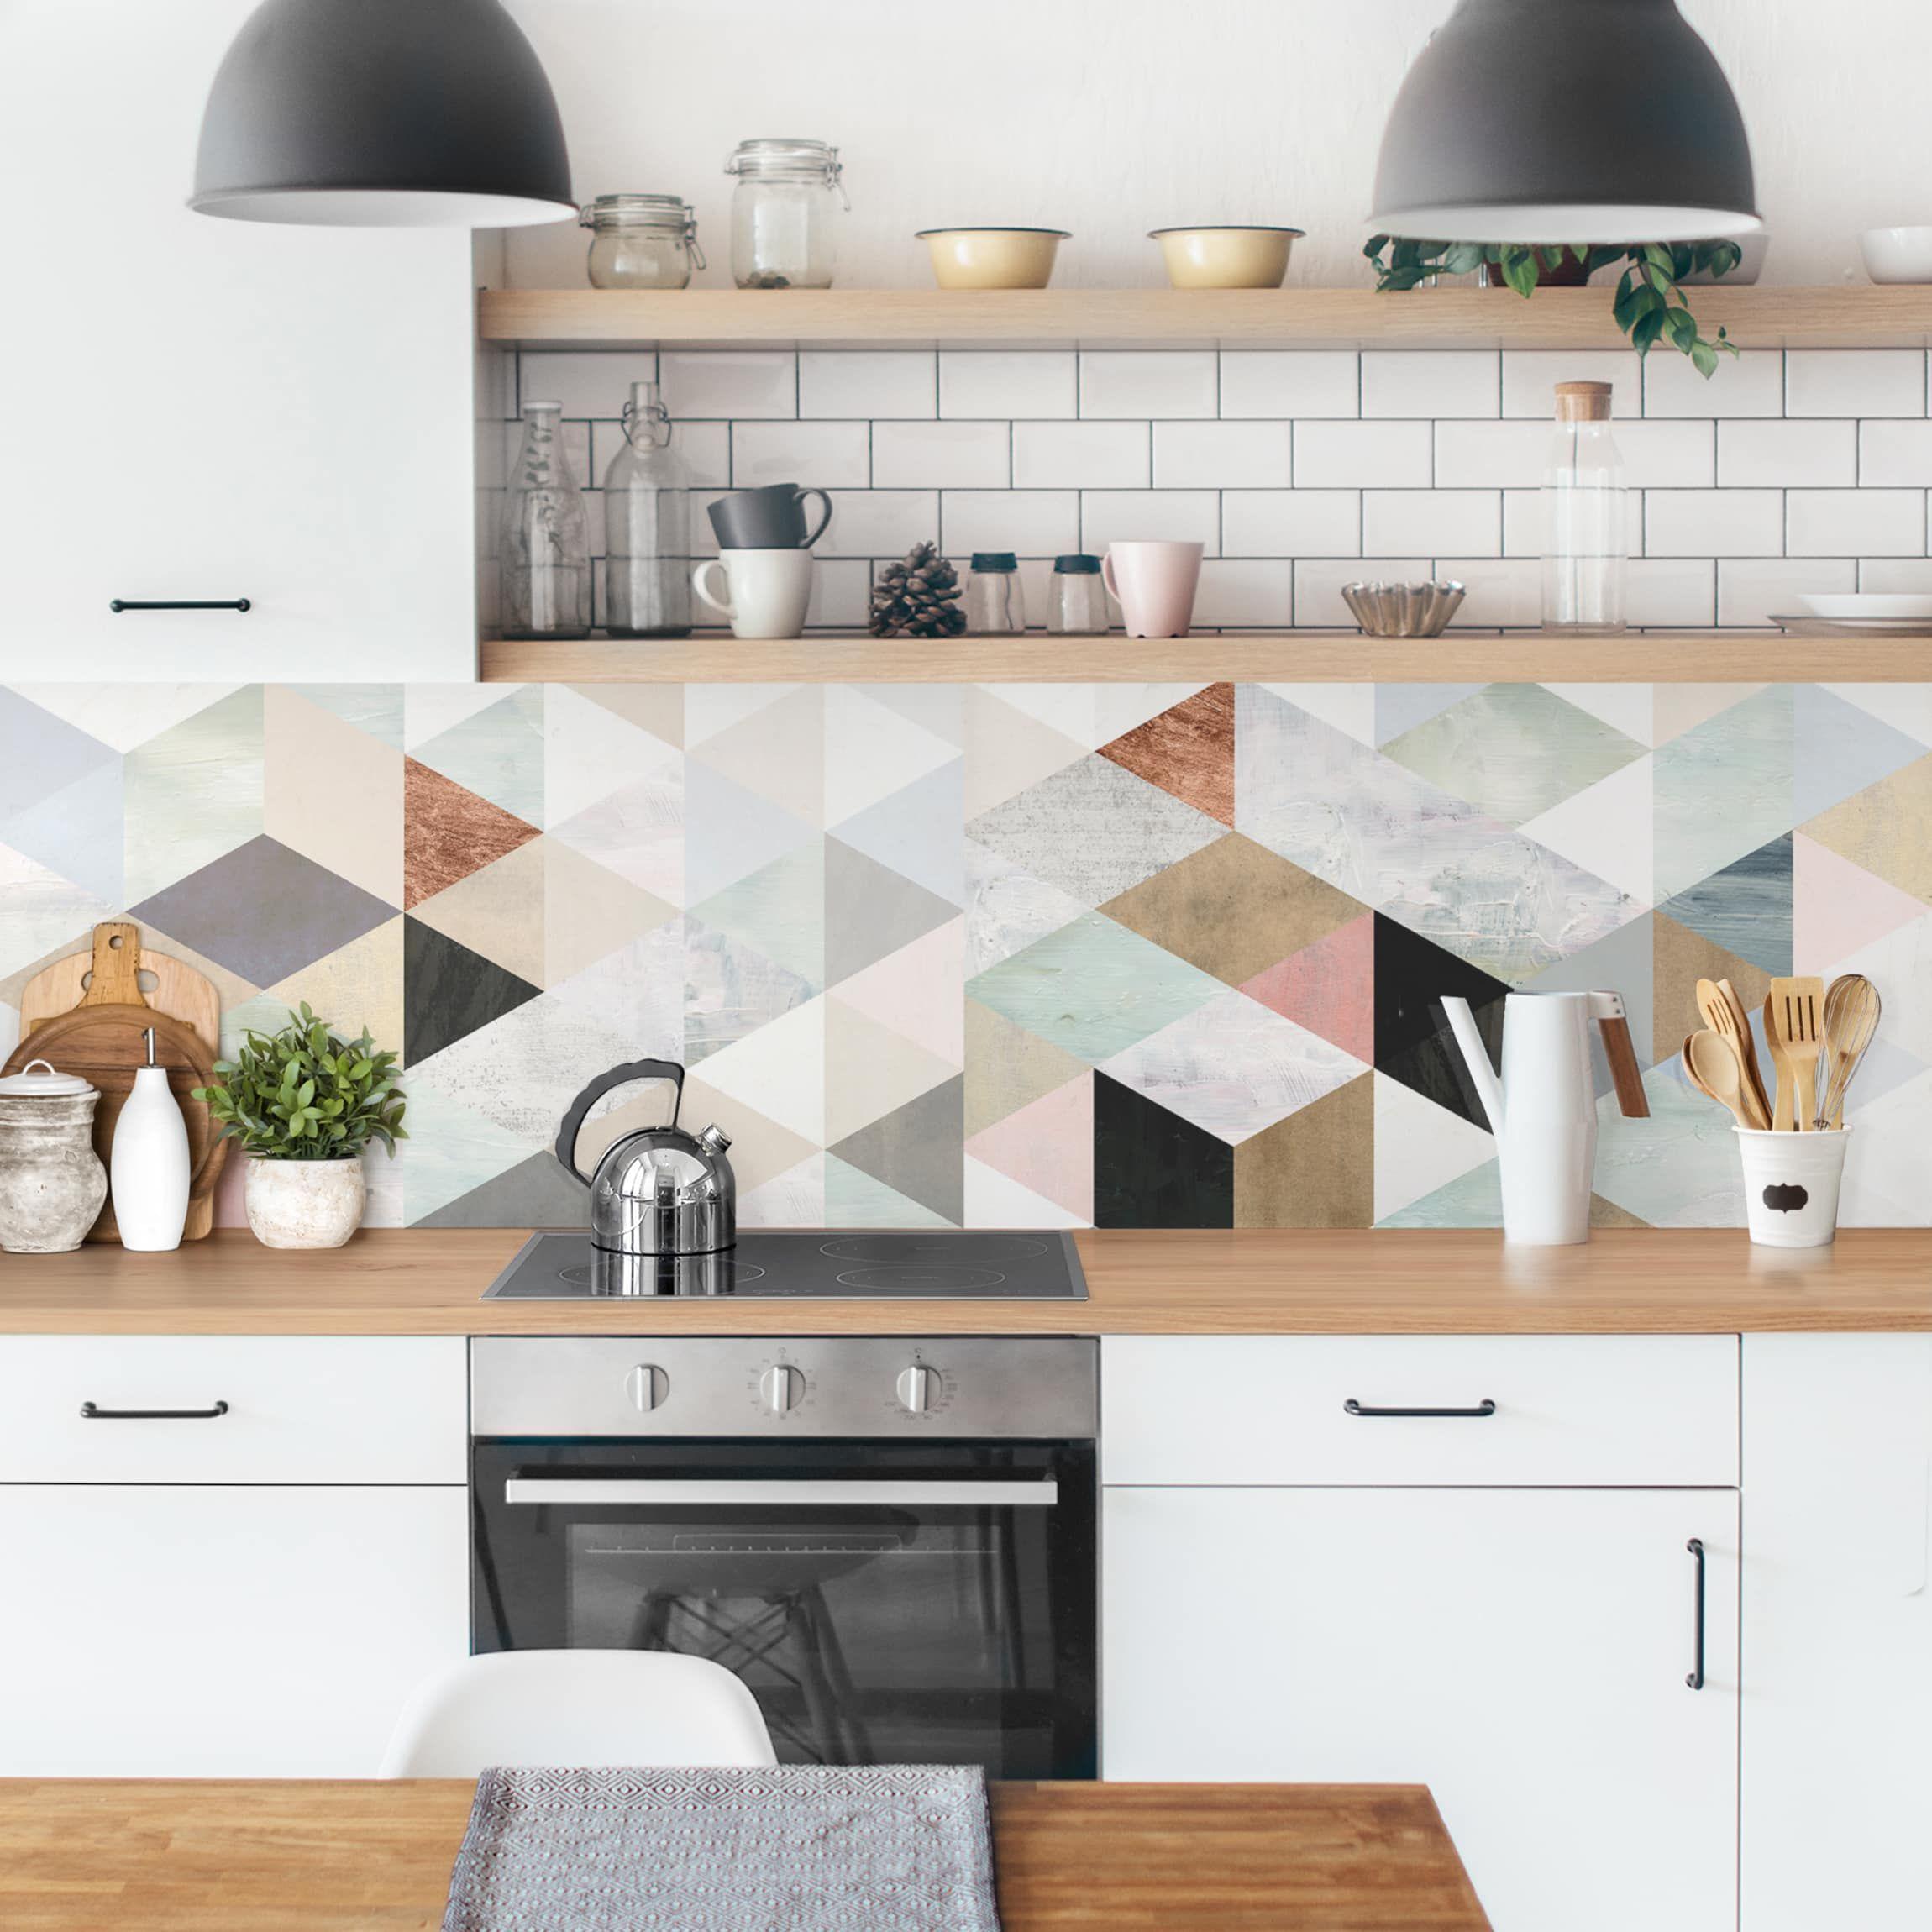 Kuchenruckwand Aquarell Mosaik Mit Dreiecken I Kuchenruckwandfolie Wandfliesen Kuche Fliesenaufkleber Kuche Kuchen Ruckwand